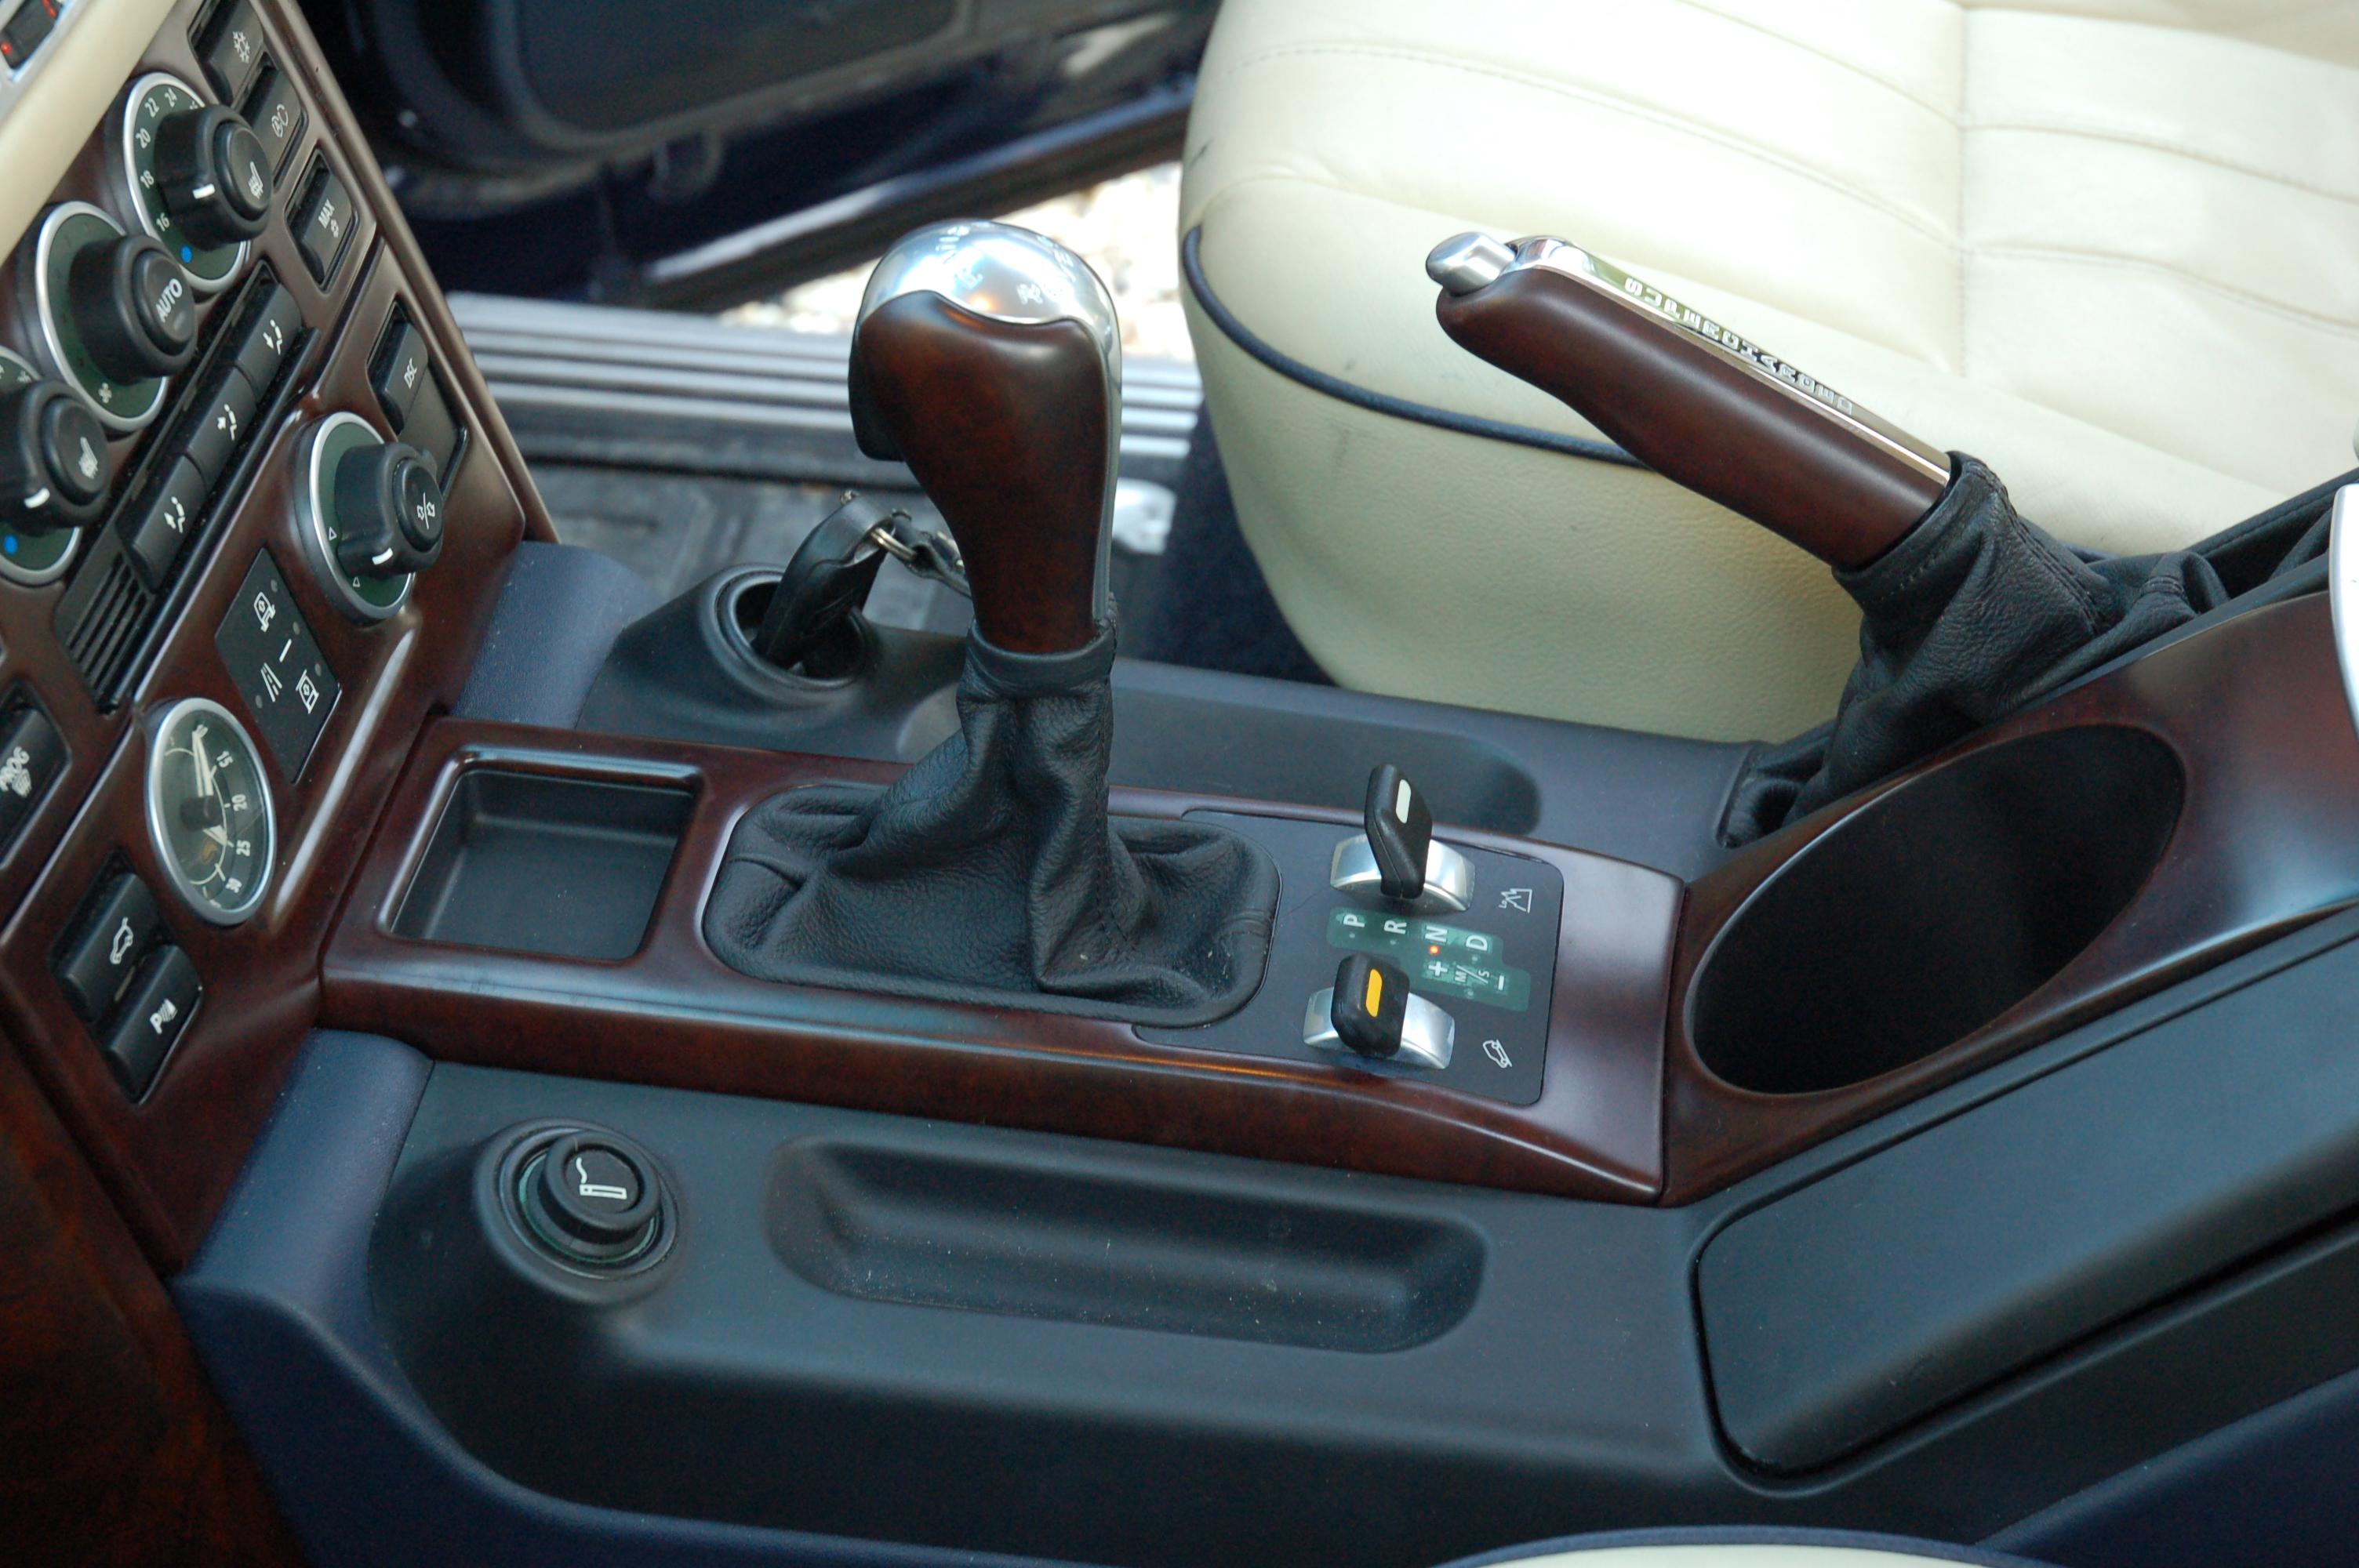 Range Rover Sport Interior Trim Removal